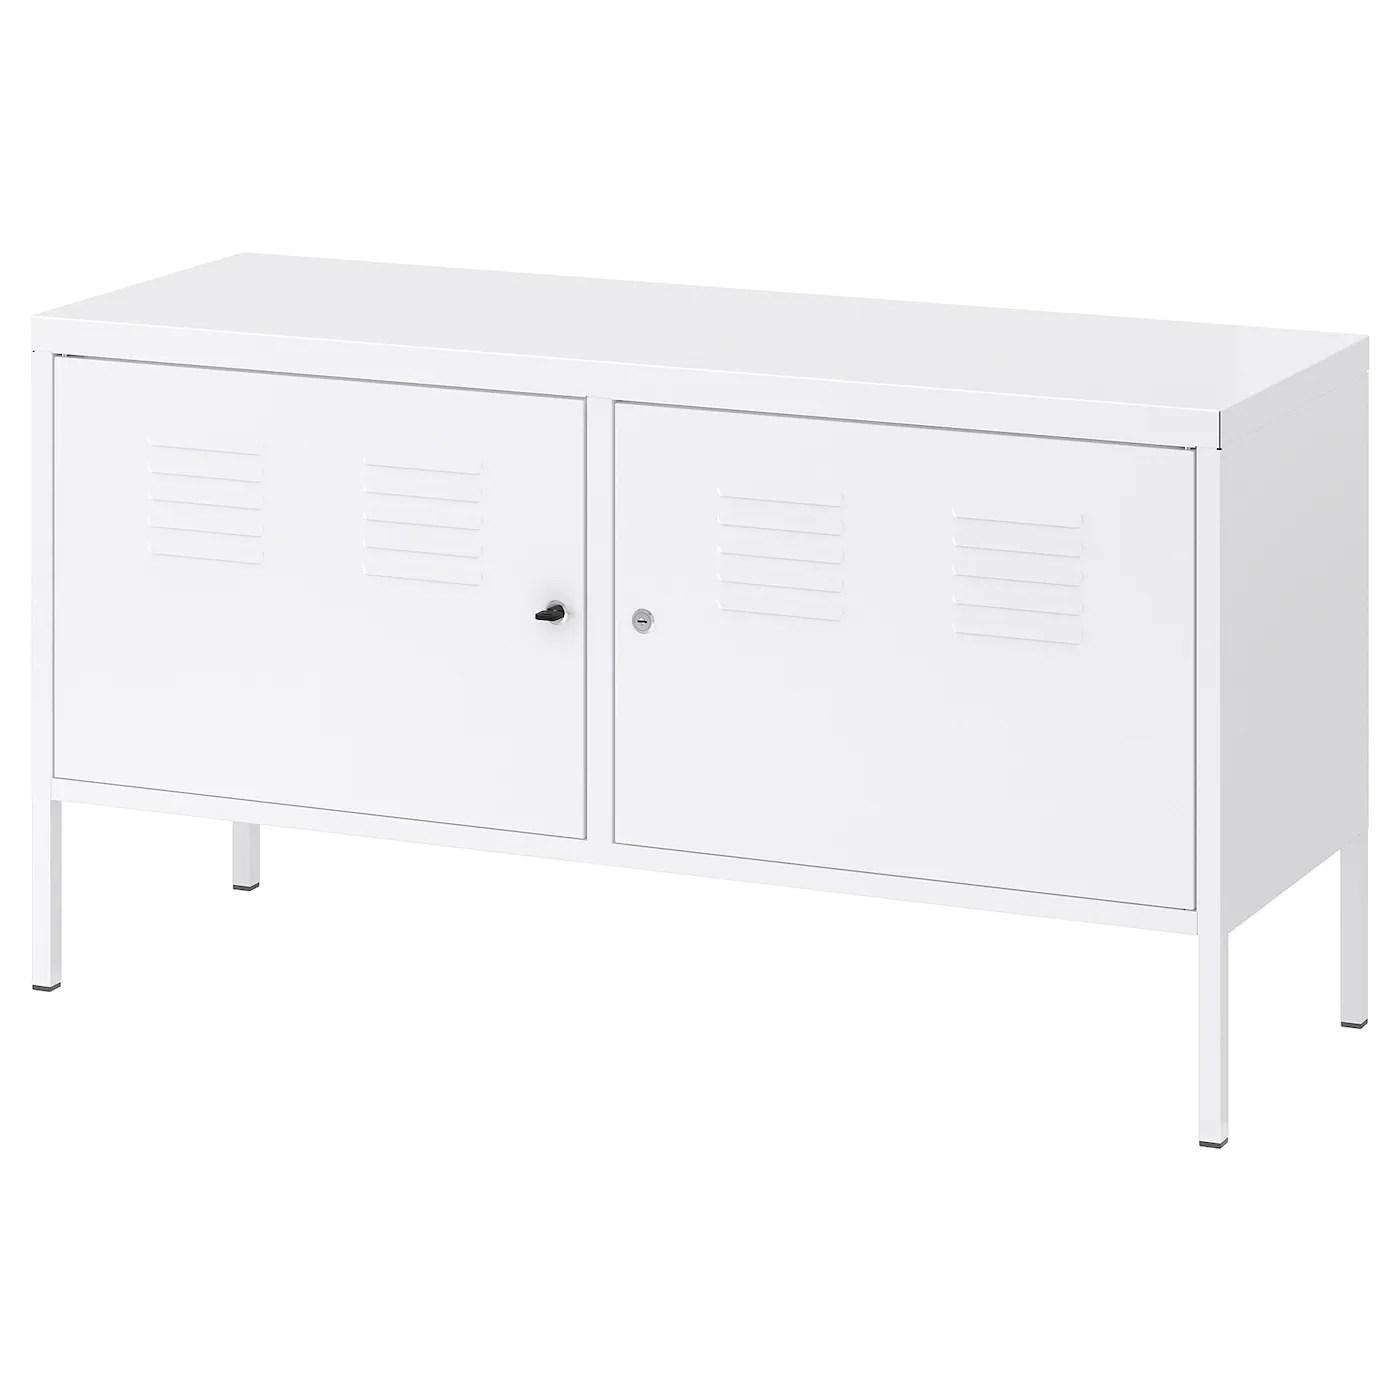 ikea ps armoire metallique blanc 119x63 cm